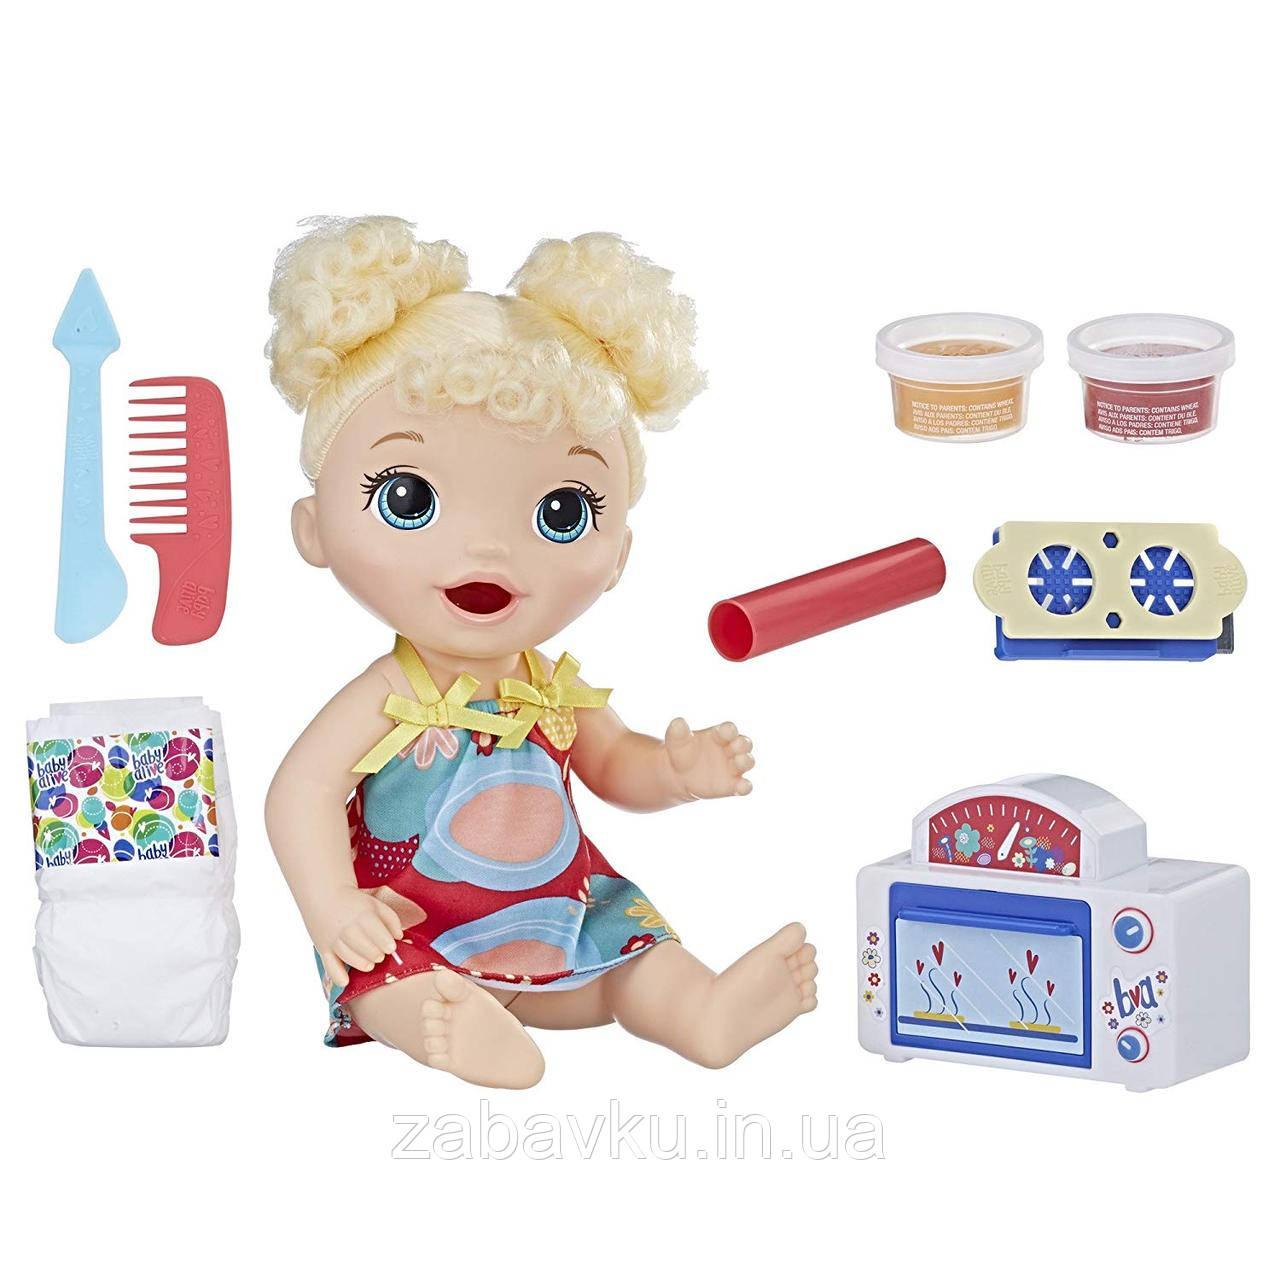 Бейбі Елайв Пупс з кухньою та їжею Baby Alive Snackin Treats Baby